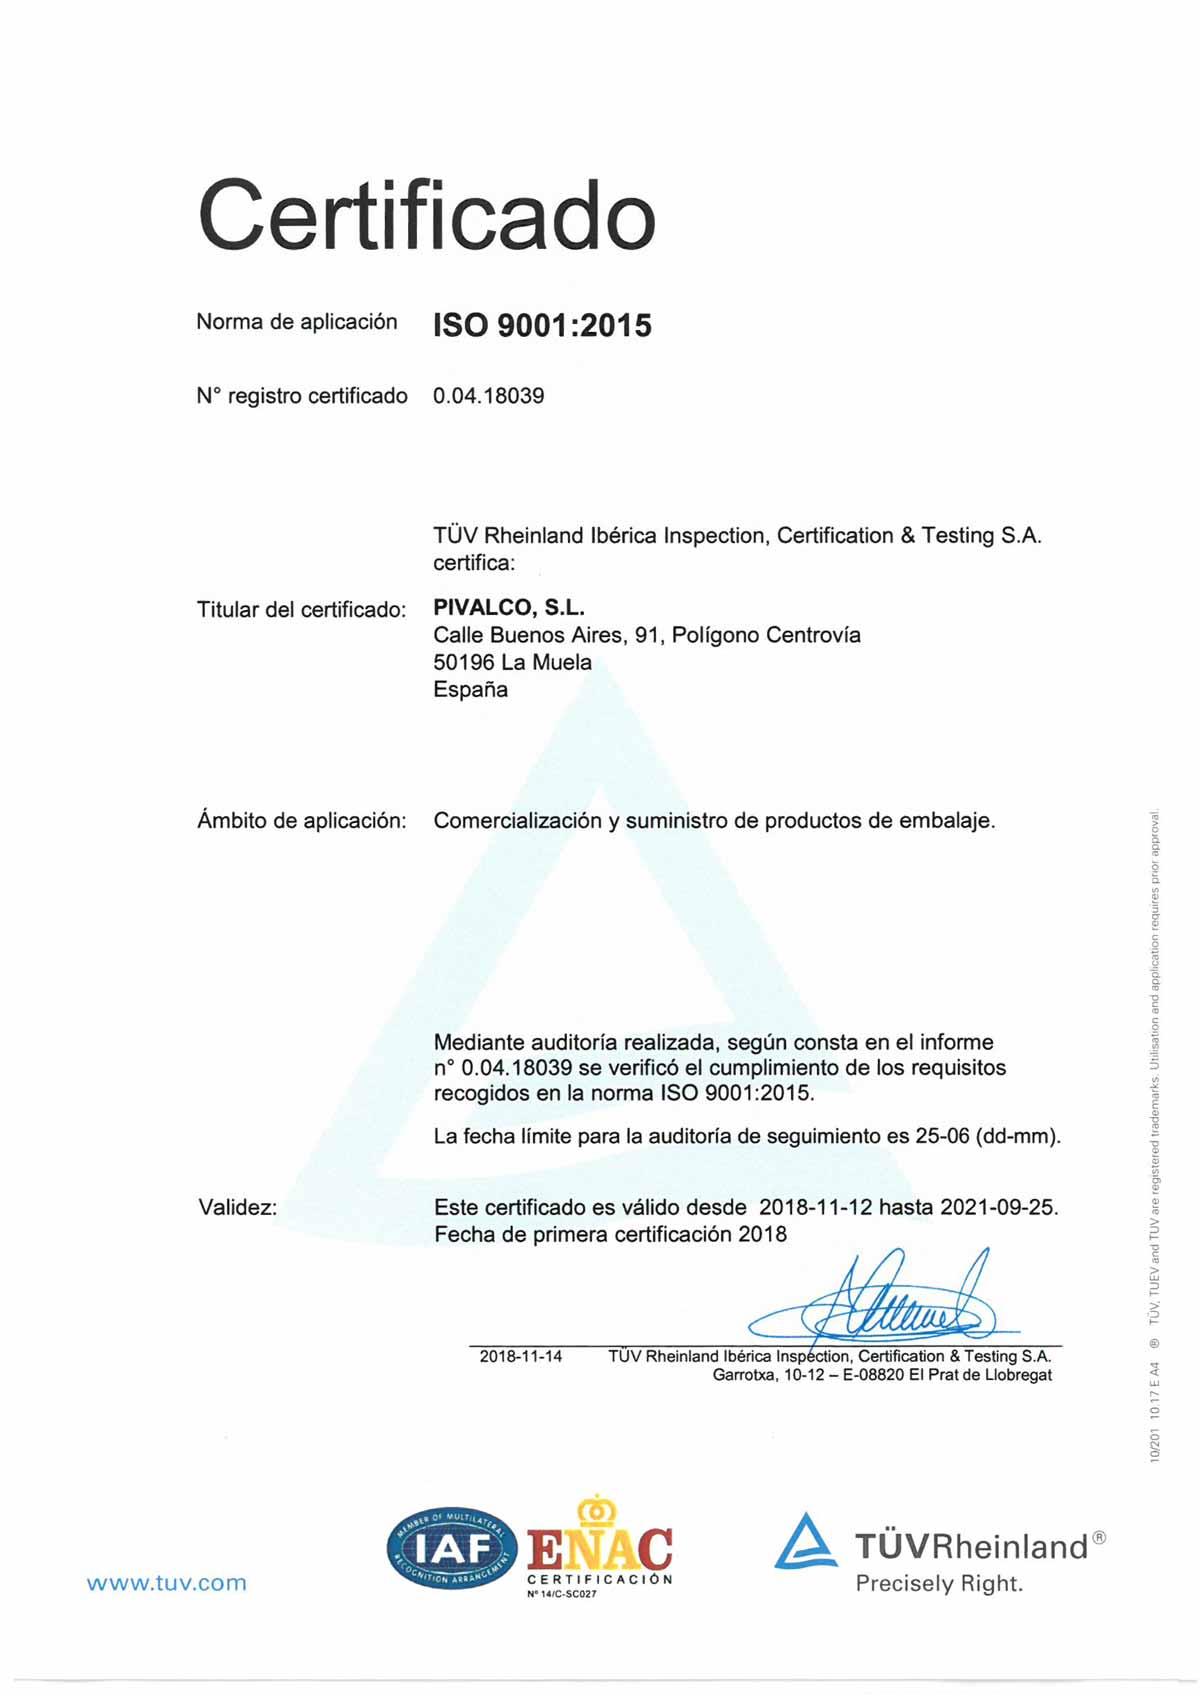 PIVALCO EMPRESA CON CERTIFICADO ISO 9001:2015